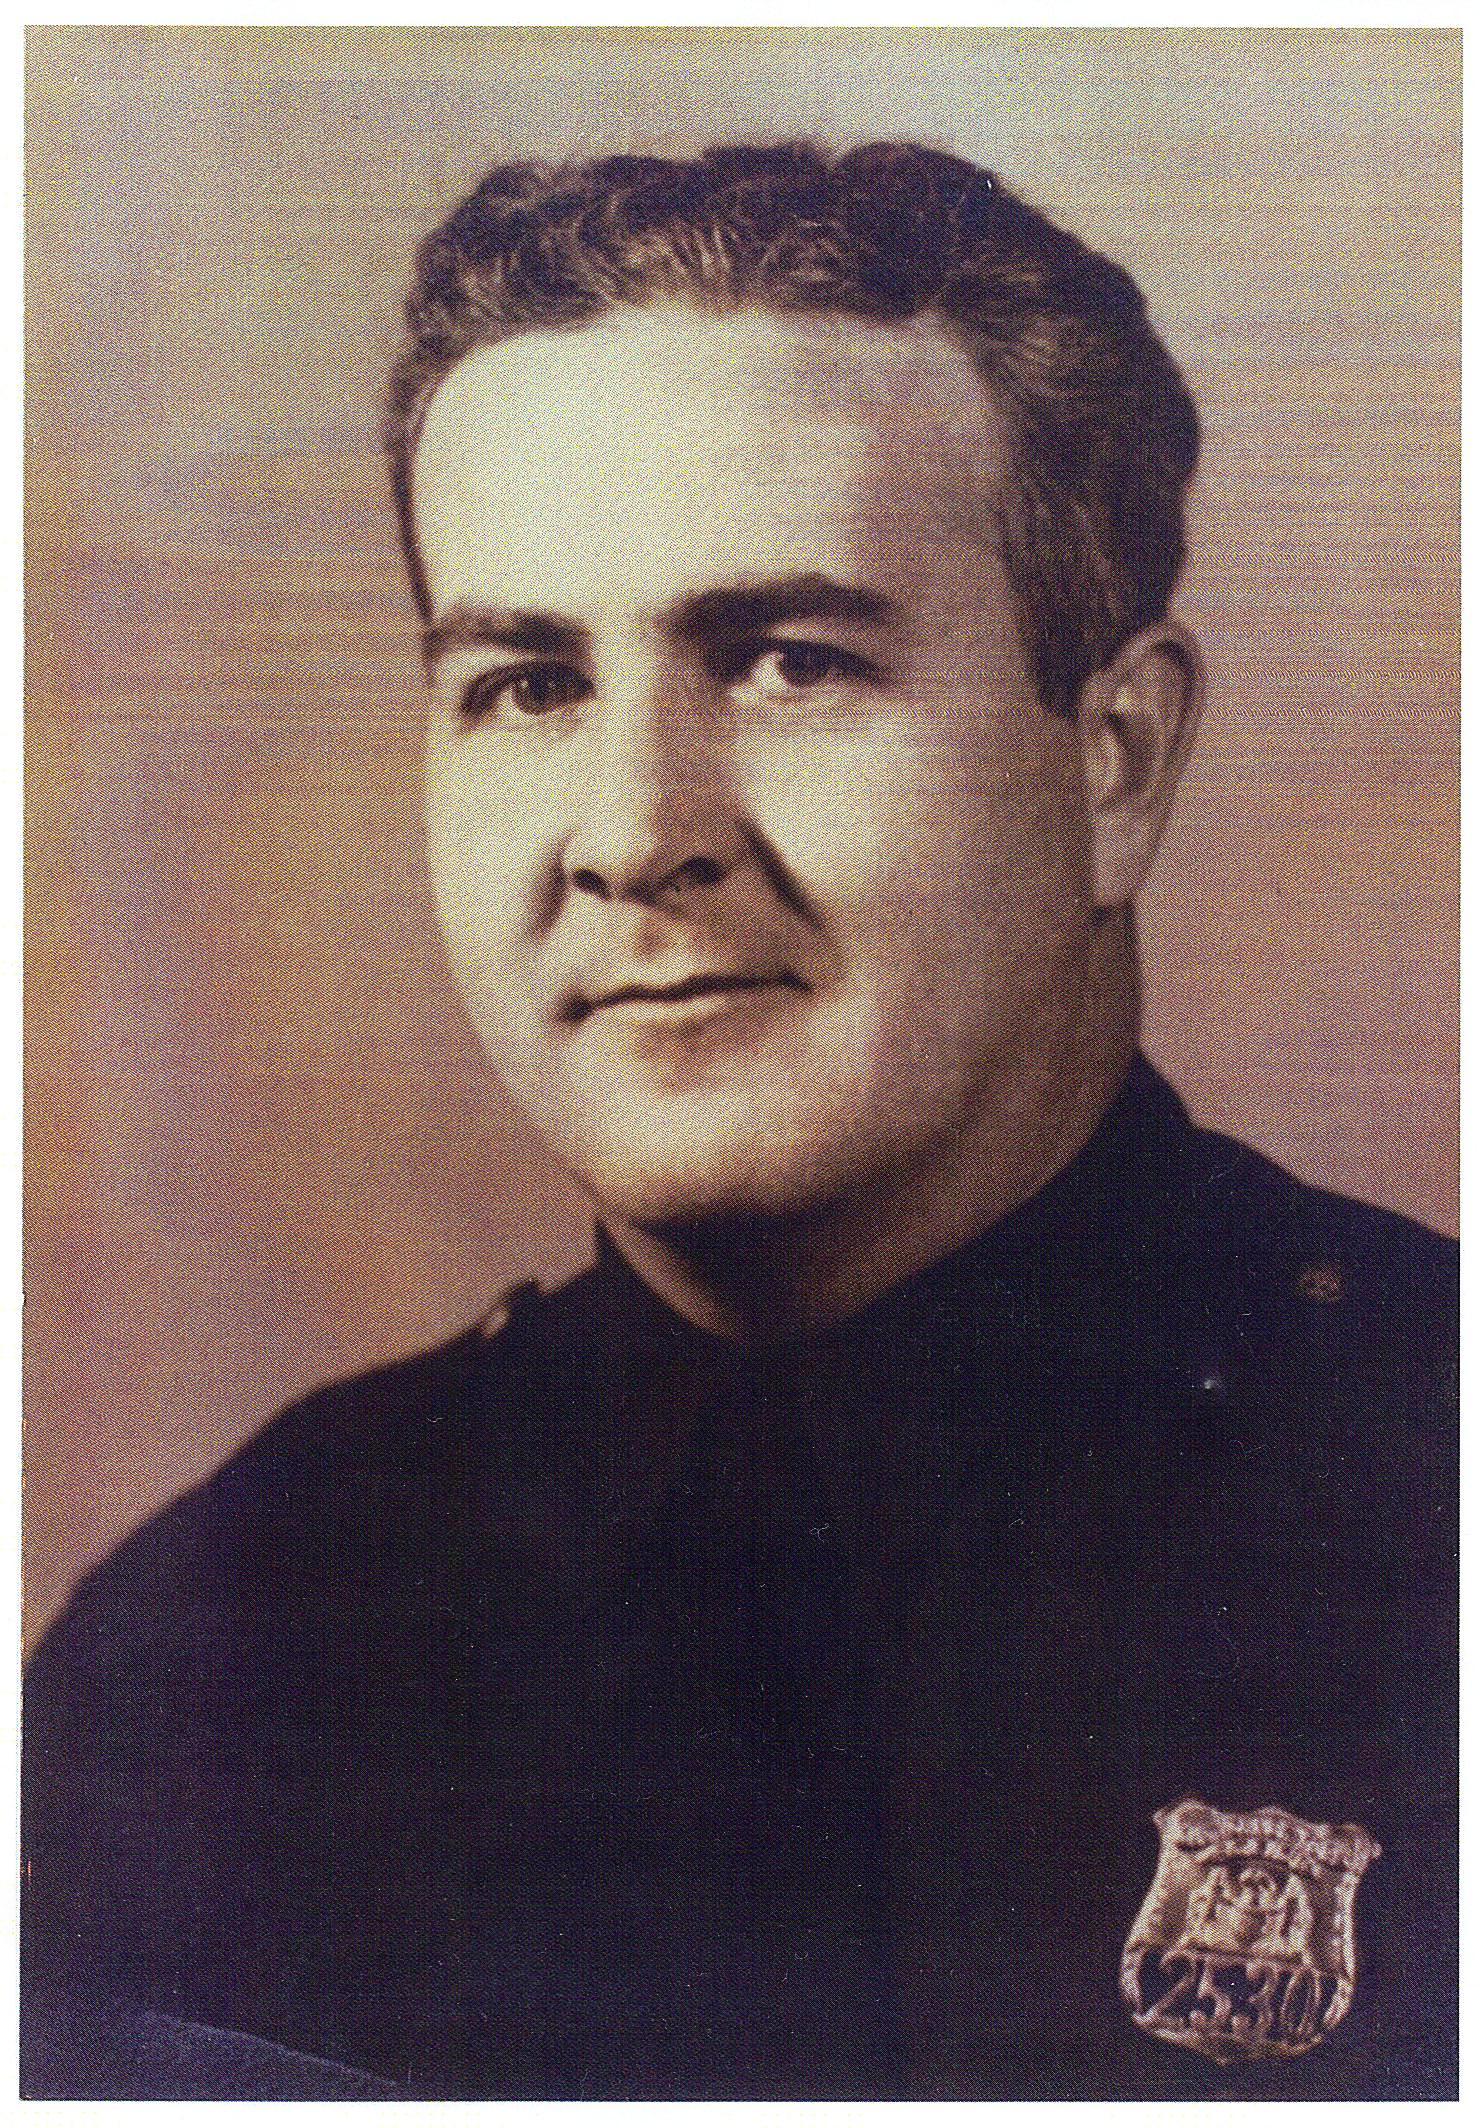 Detective Walter Ferguson | New York City Police Department, New York